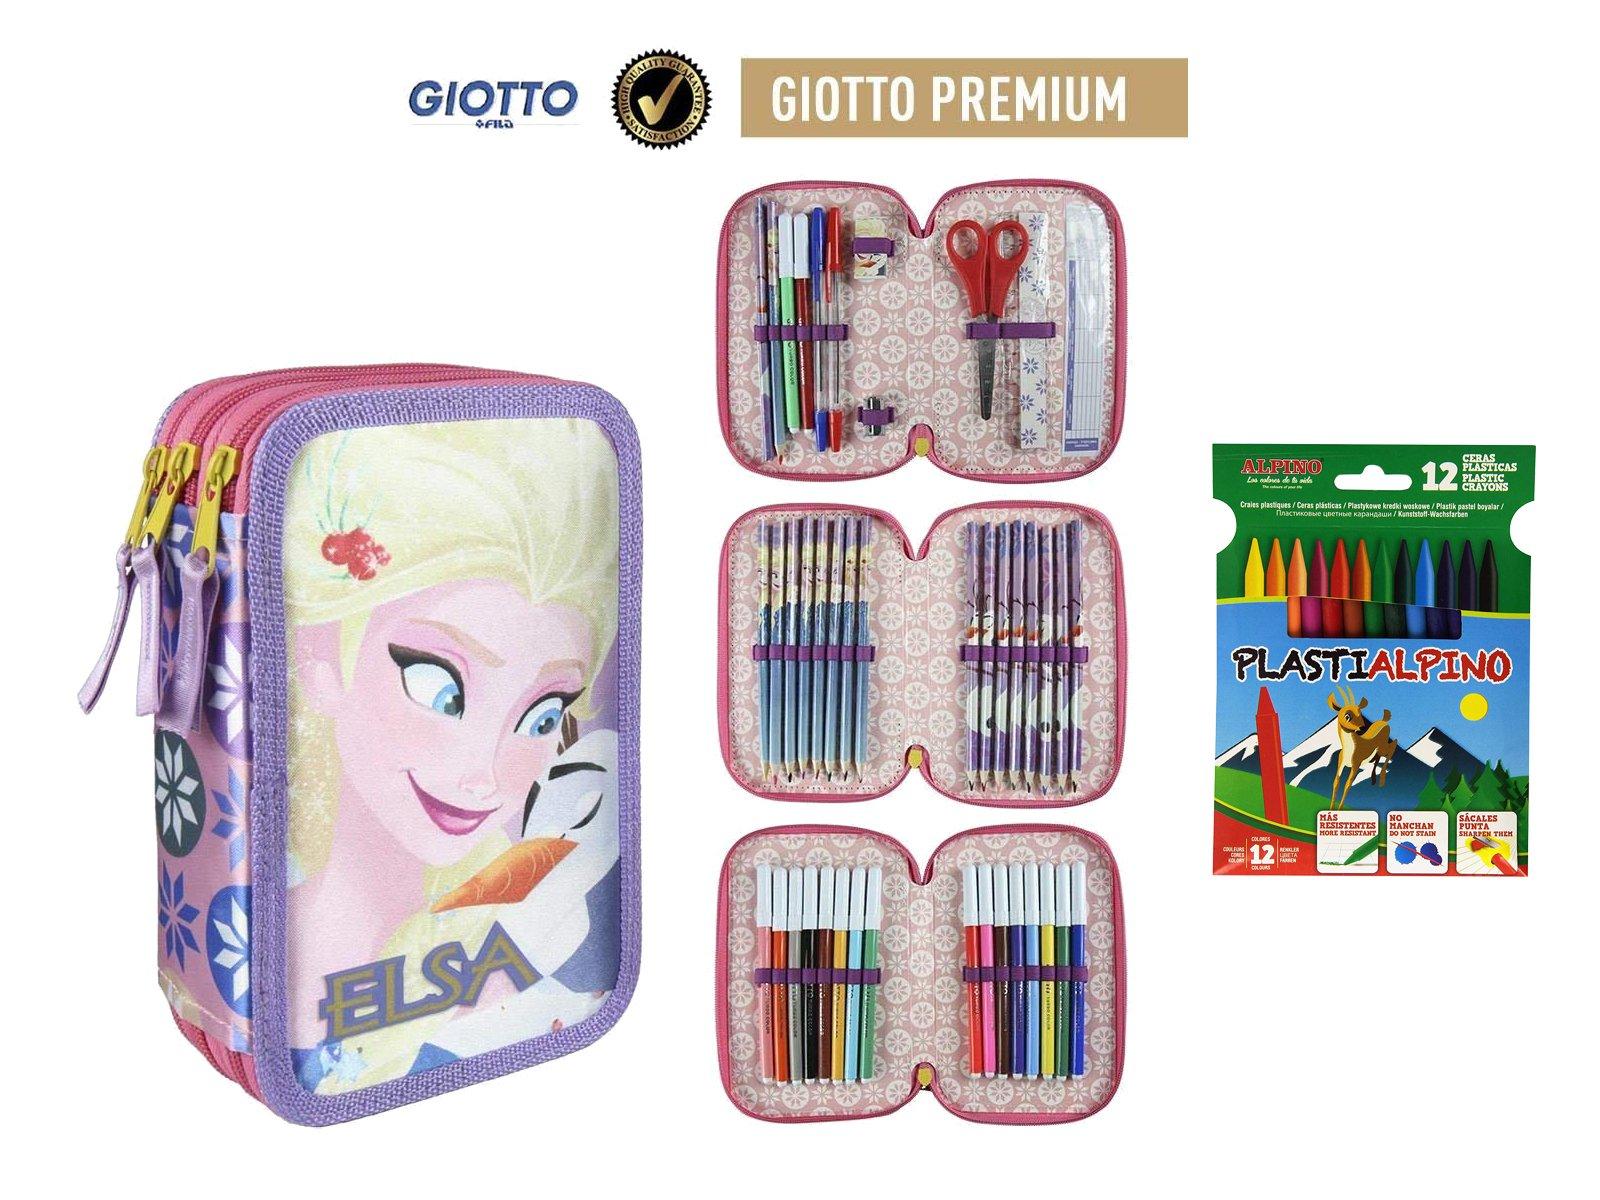 Plumier Estuche Premium de Cremallera Triple 3 Pisos Frozen – Elsa – 43 Piezas Contenido Giotto + Regalo 12 Ceras Alpino Plastialpino